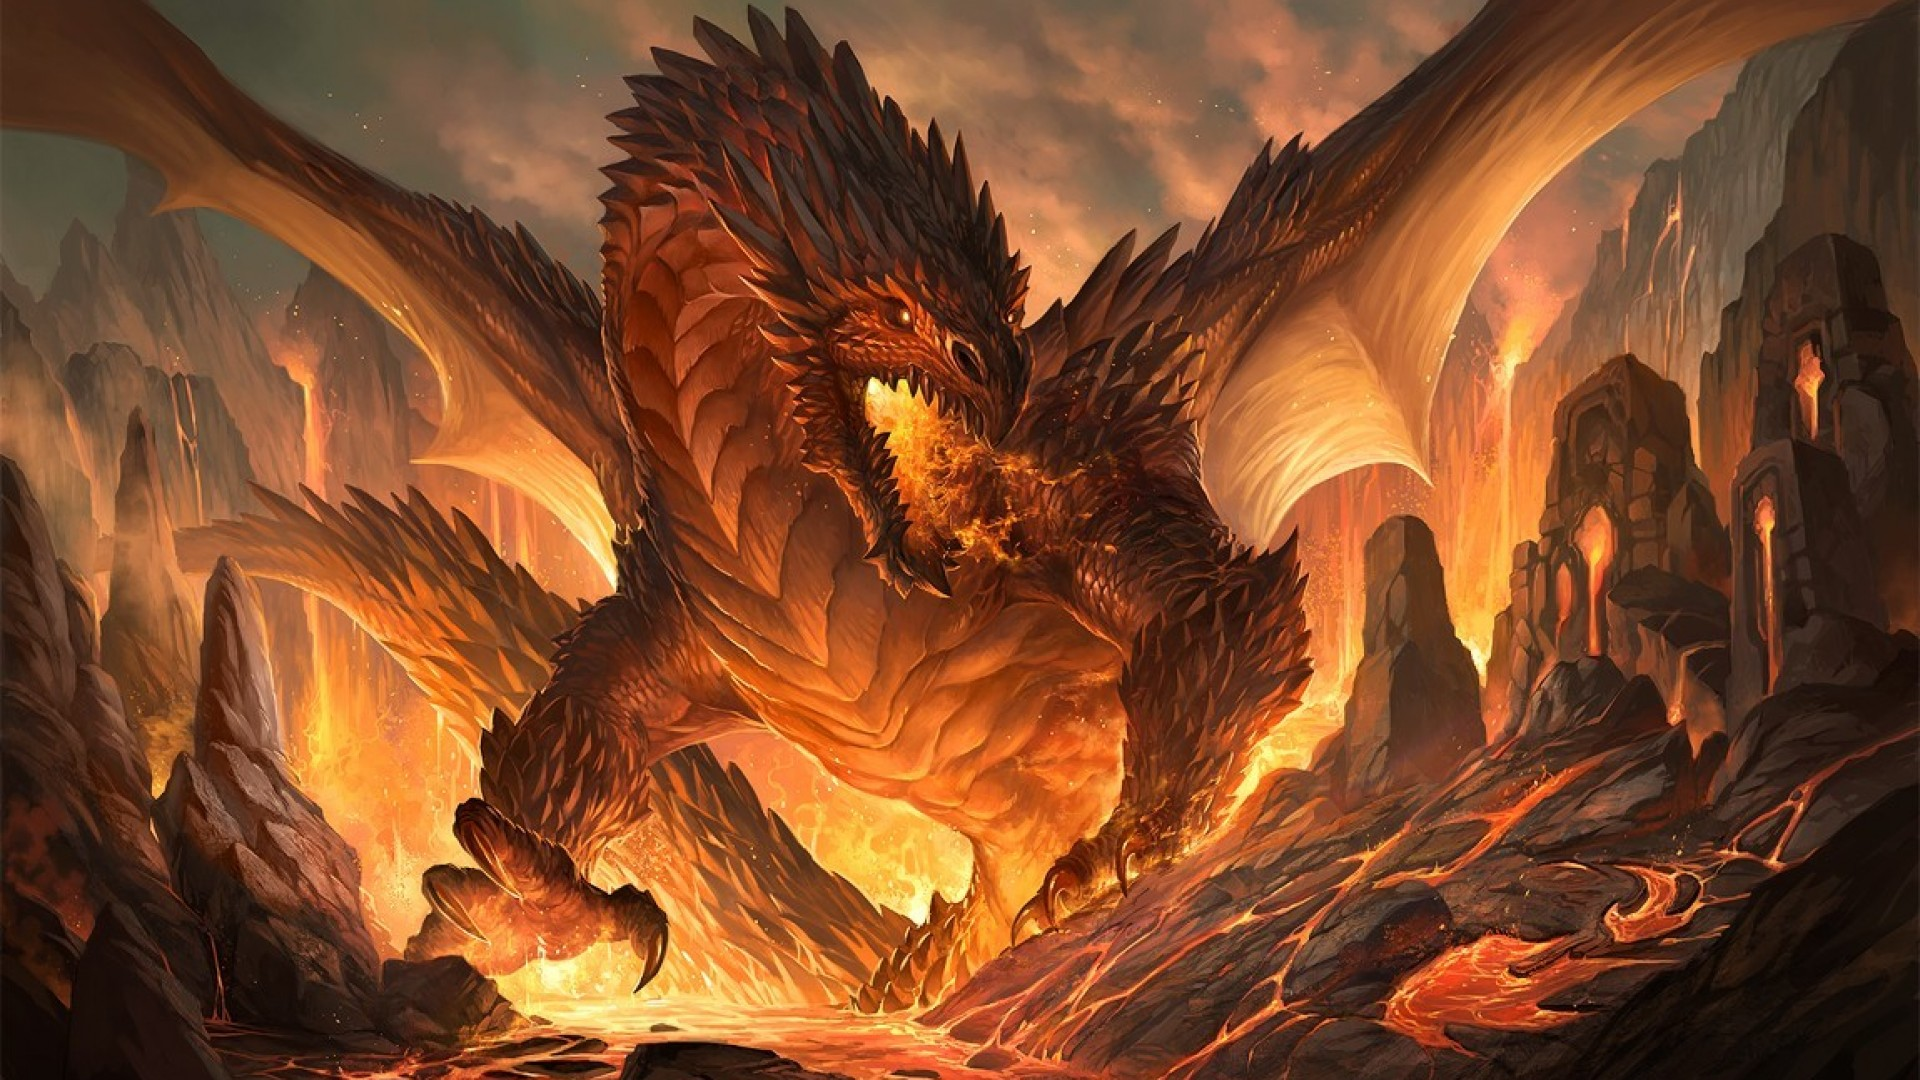 Dragon fantasy art